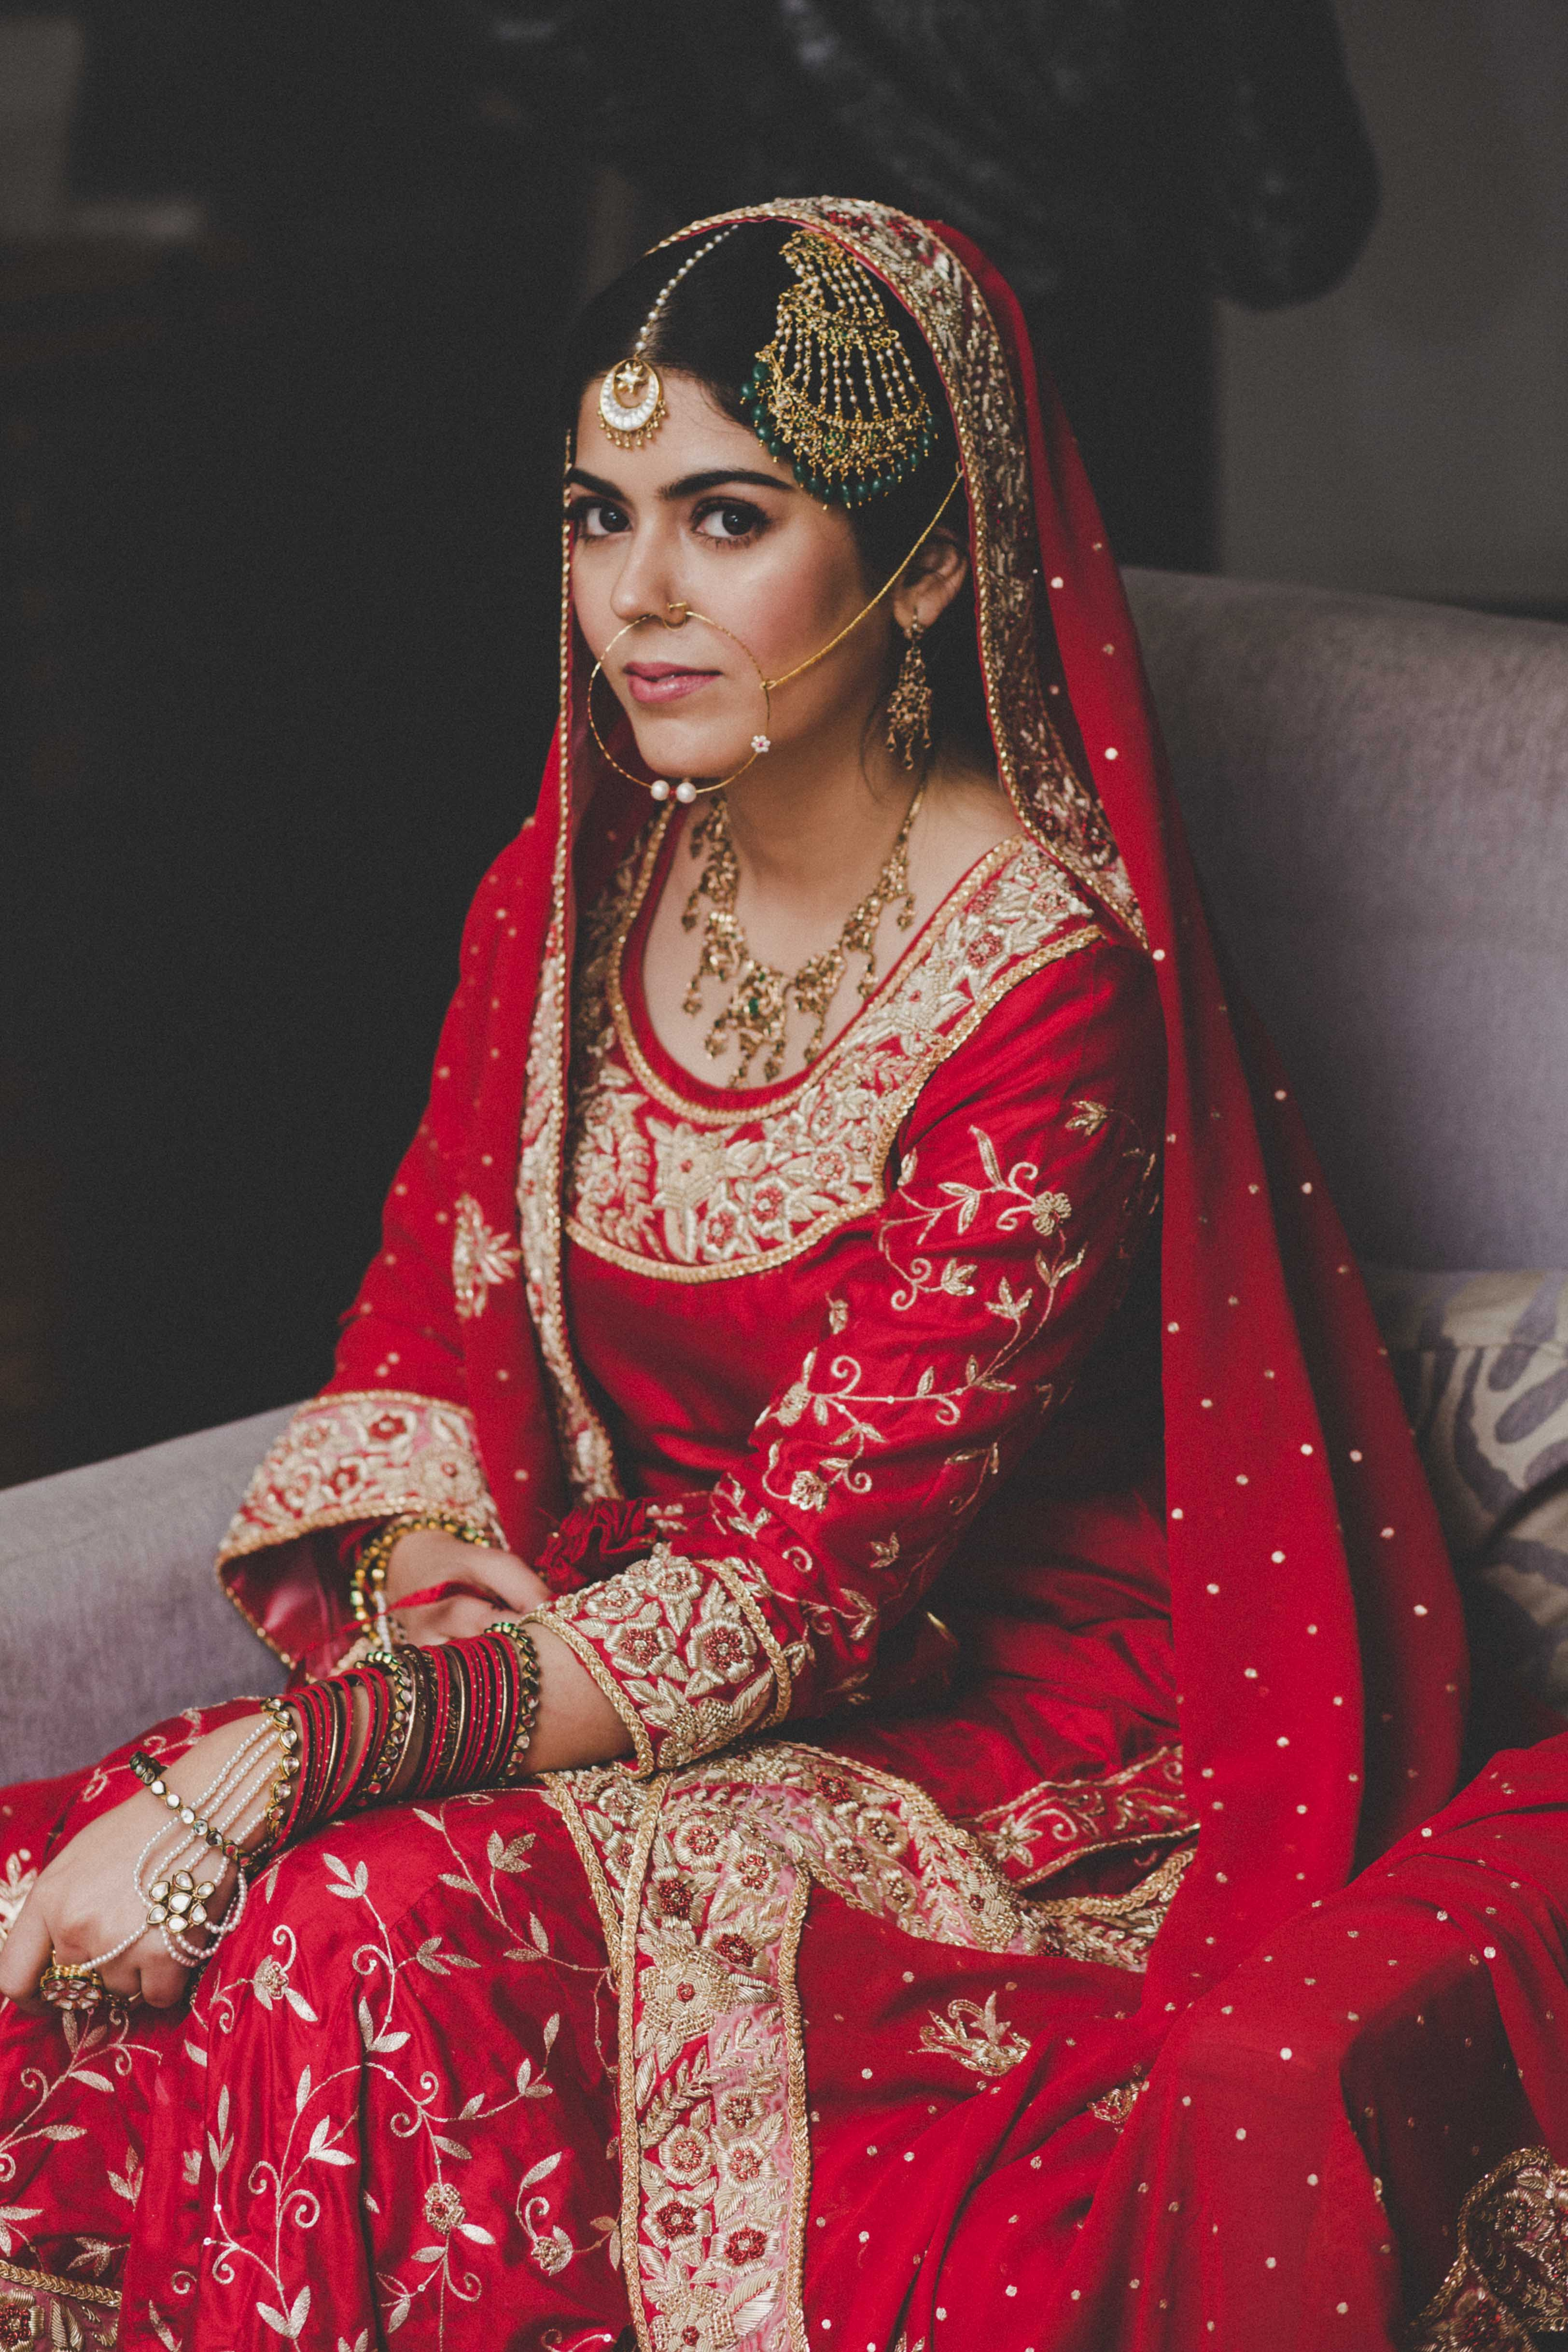 nikah, muslim bride, bridal makeup, makeup artist, wedding photographer, camera waale